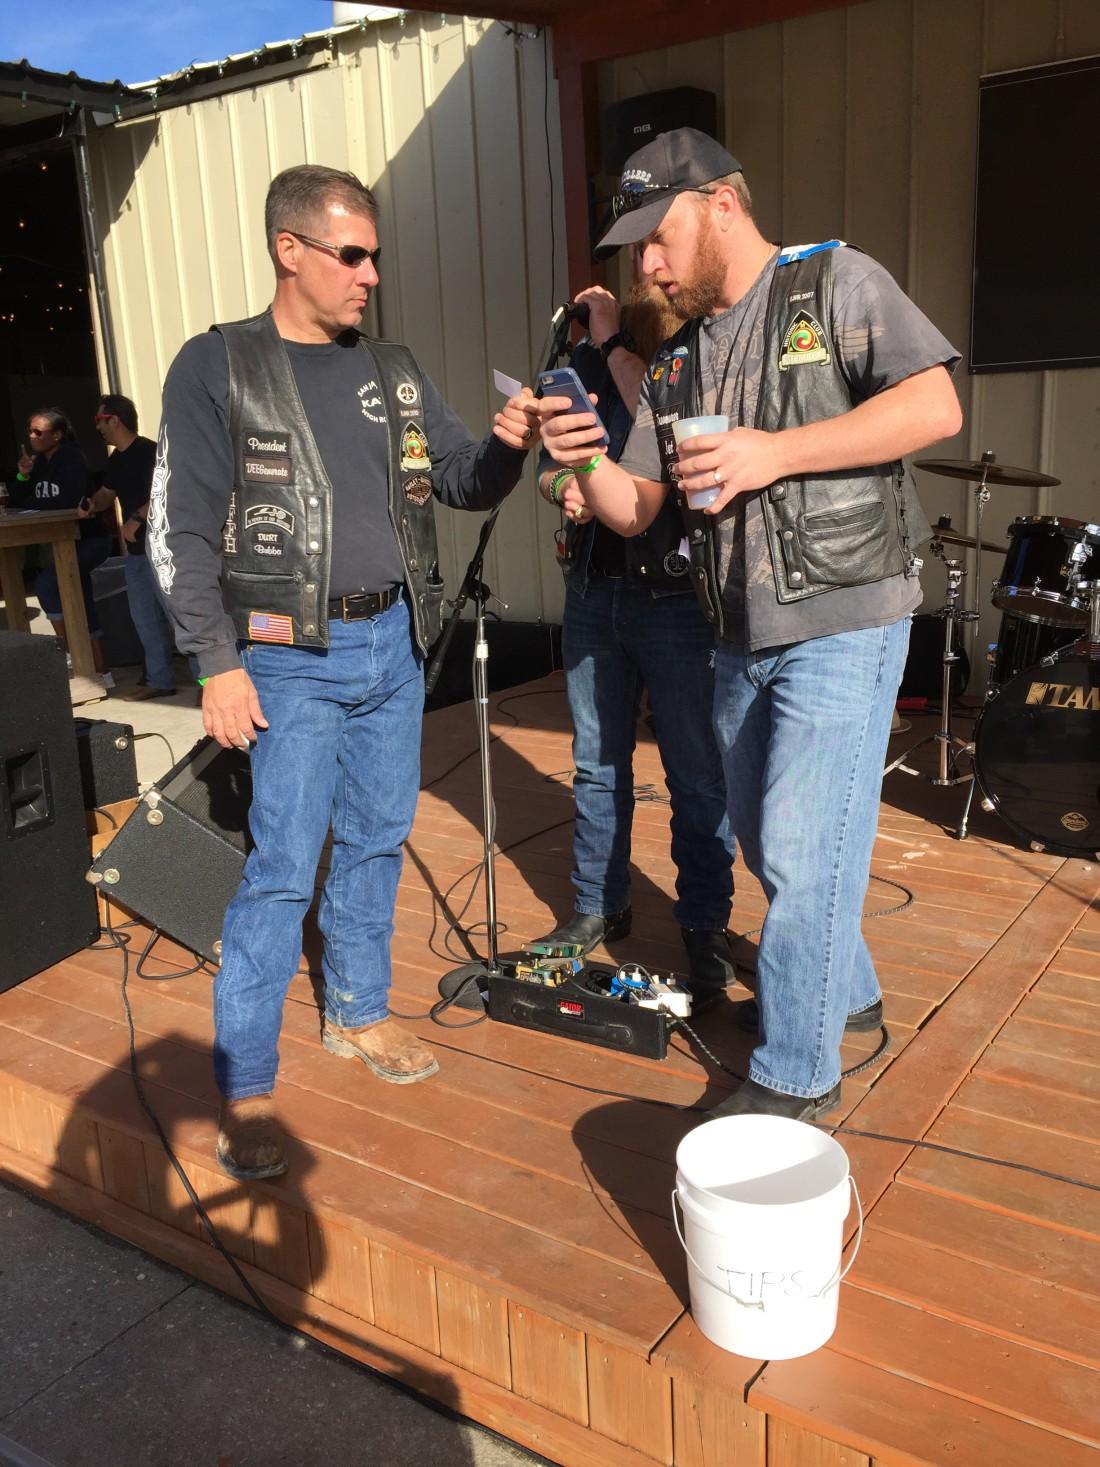 SJHRMC Holiday Liquor Wagon – December 2015 by San Jacinto High Rollers MC - Katy Texas Chapter